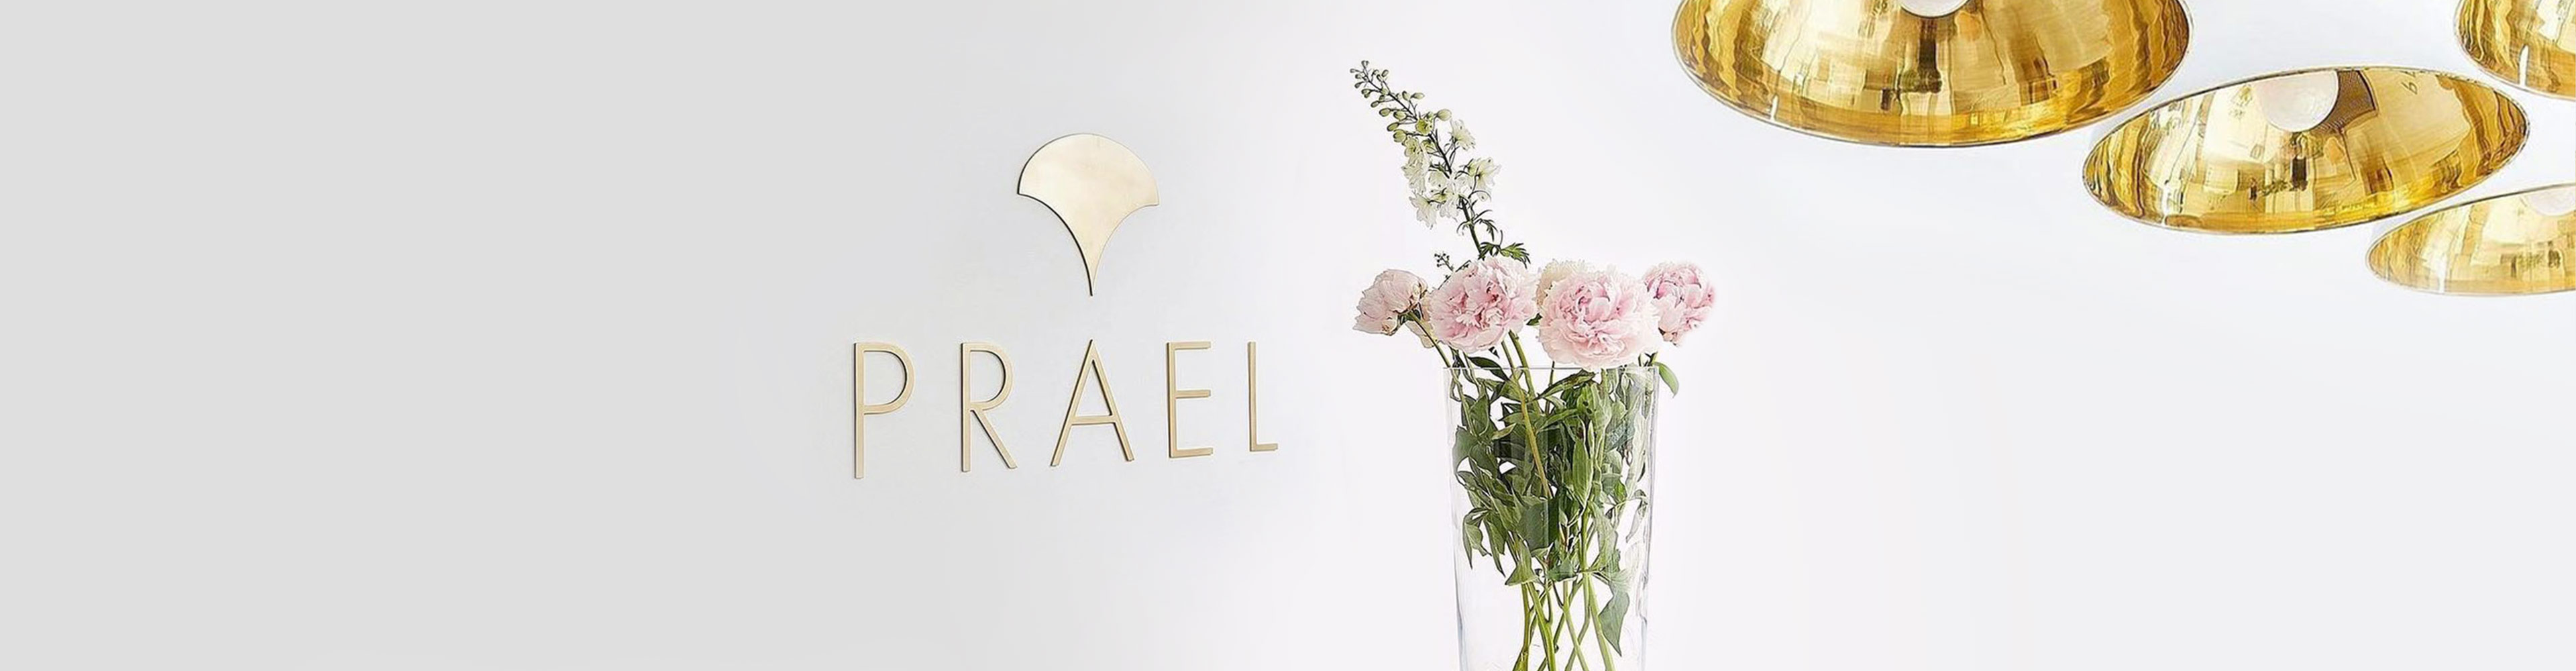 Prael logo bouquet